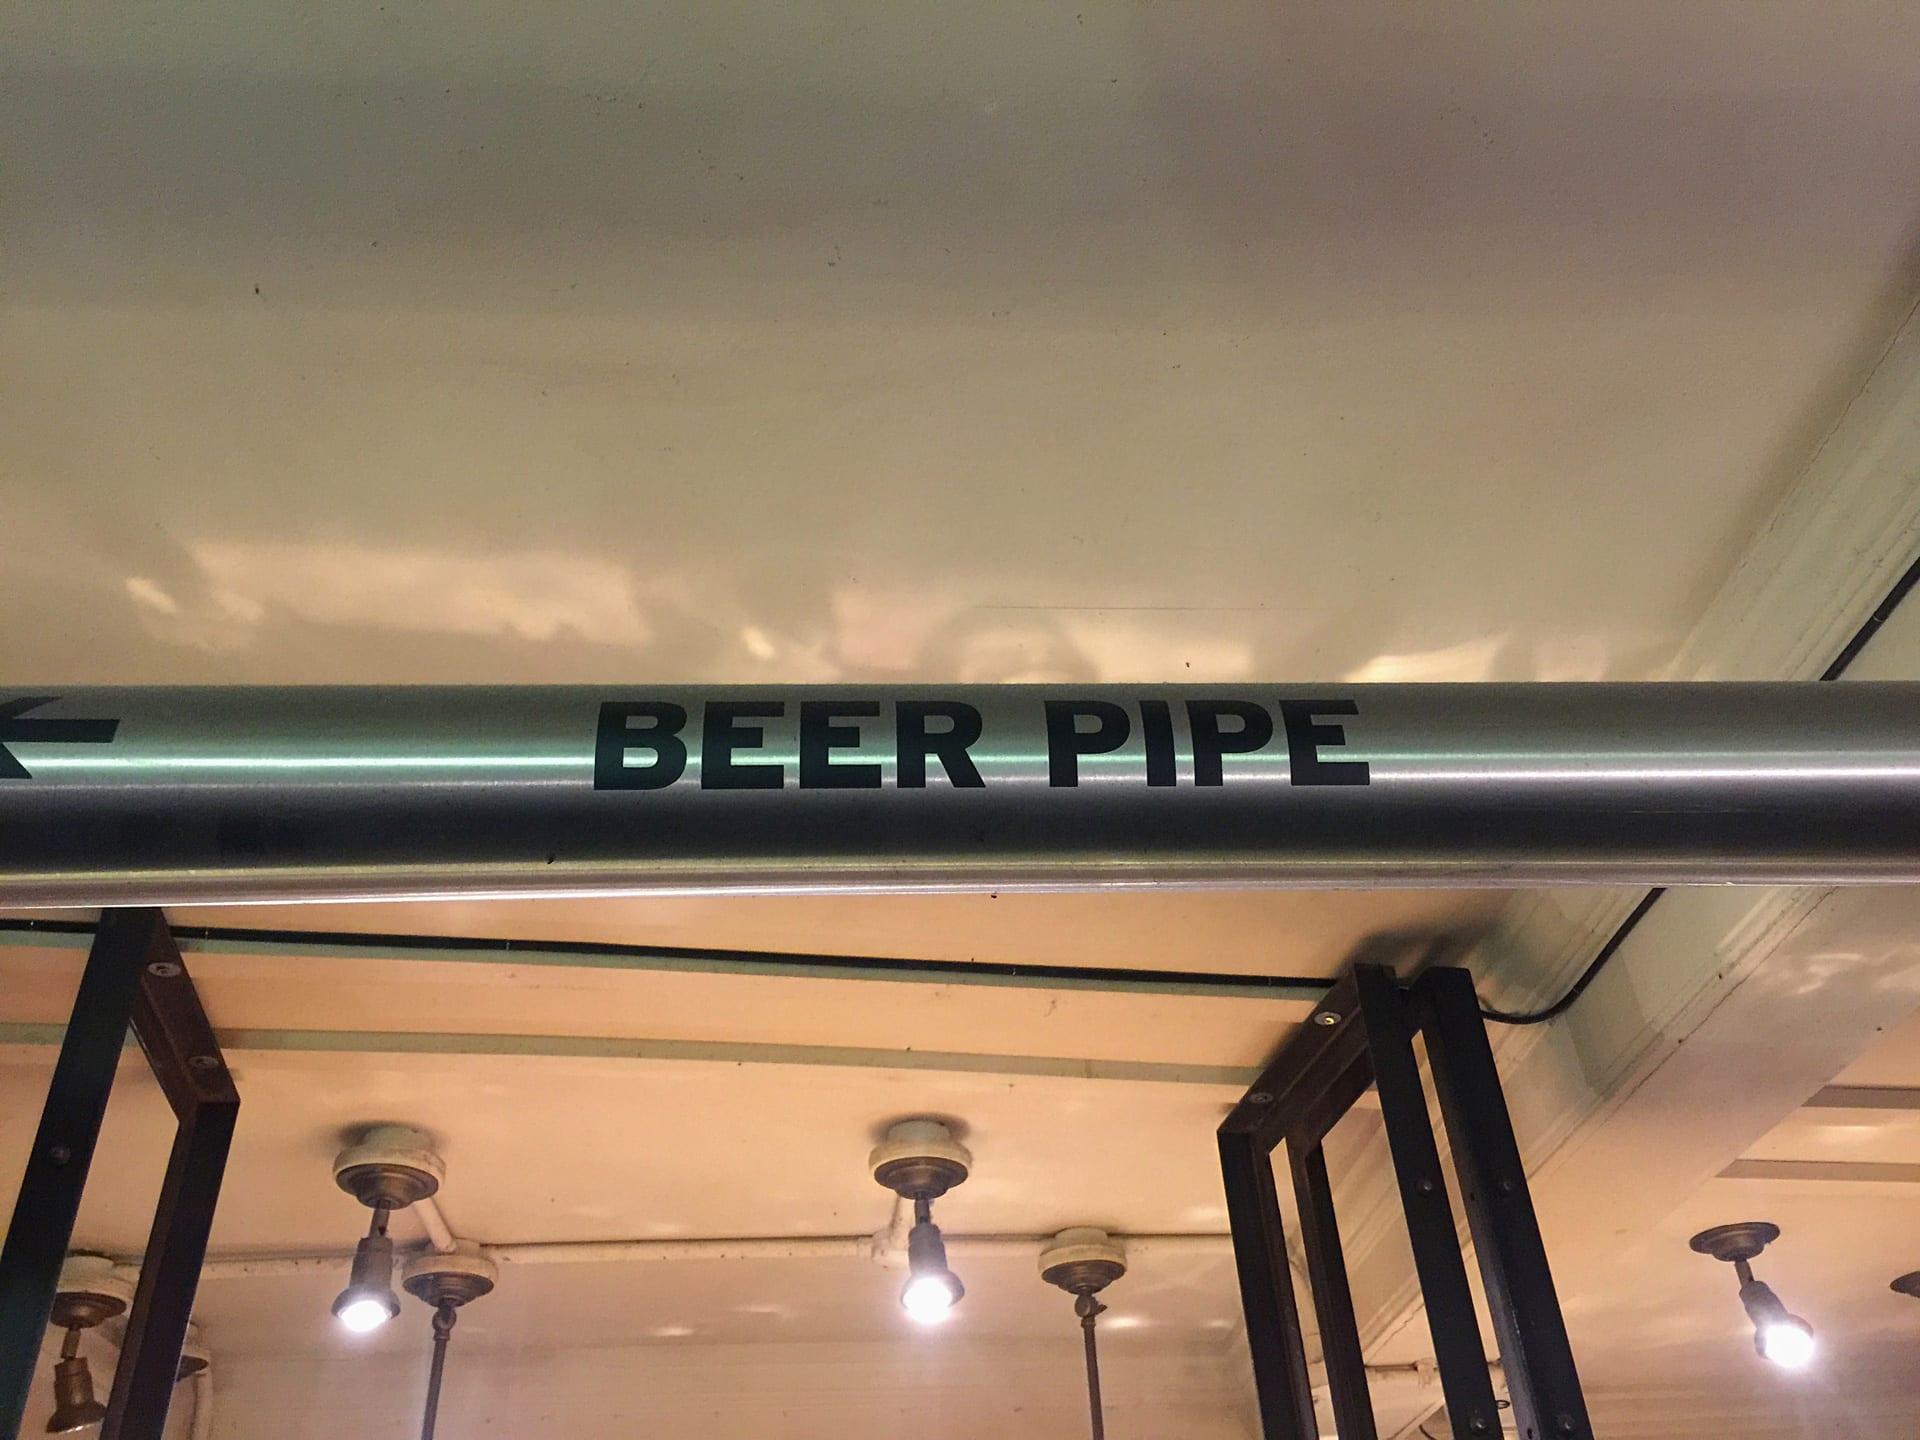 wheatsheaf-pu-borough.market-cerveza170504182540001